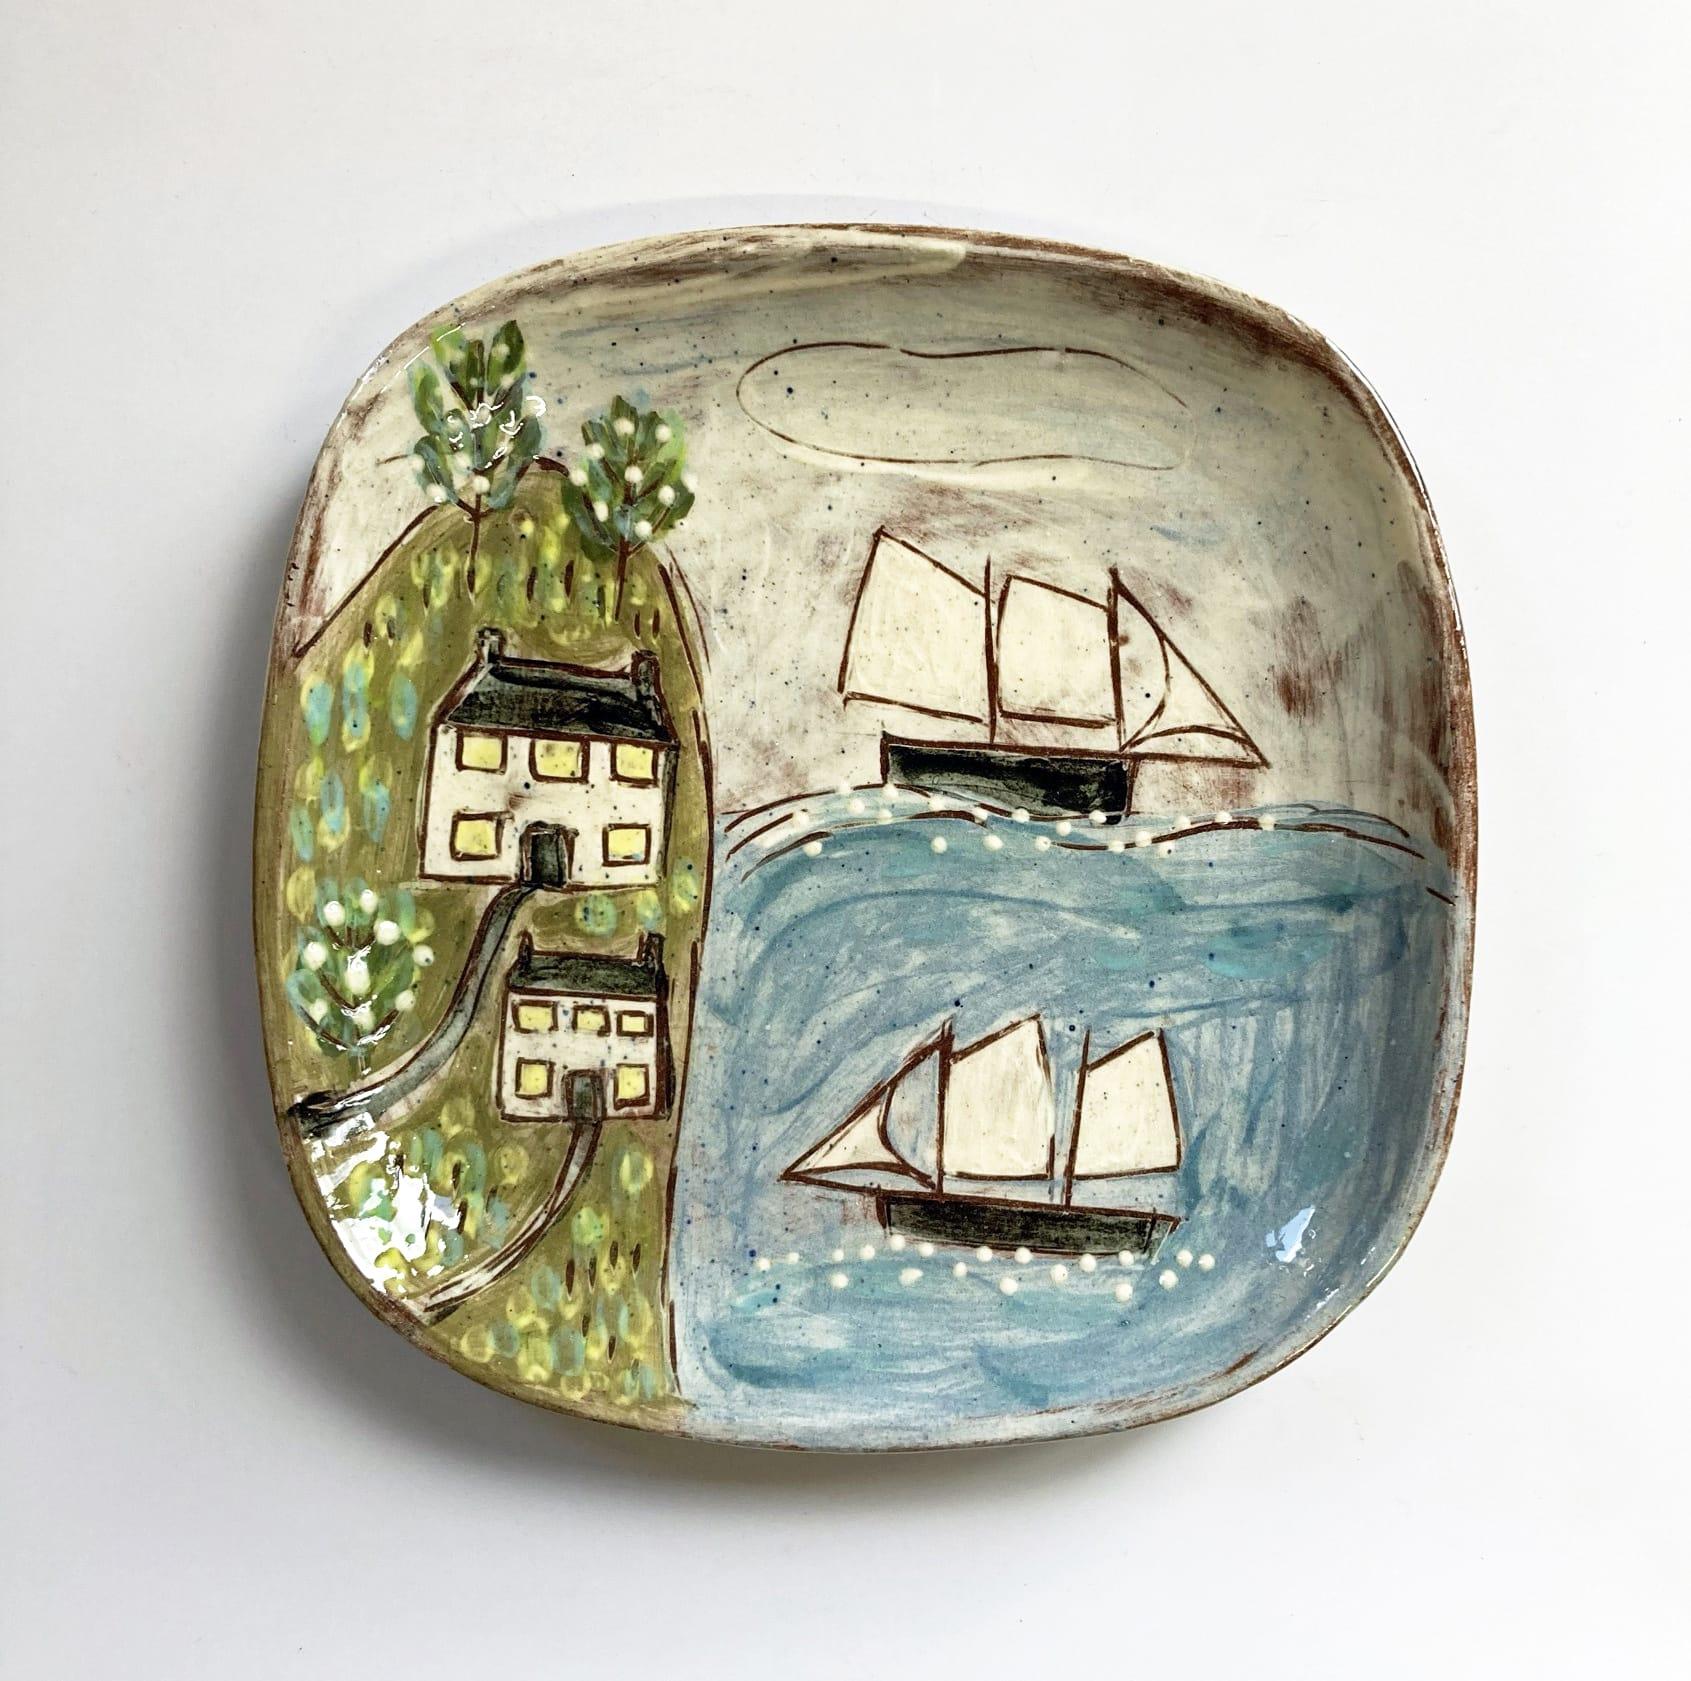 "<span class=""link fancybox-details-link""><a href=""/artists/428-anne-barrell/works/7742-anne-barrell-off-shore-commission-2021/"">View Detail Page</a></span><div class=""artist""><strong>Anne Barrell</strong></div> <div class=""title""><em>Off Shore Commission </em>, 2021</div> <div class=""medium"">handmade, handpainted ceramic</div> <div class=""dimensions"">16 x 16 cm</div><div class=""copyright_line"">Ownart: £6.60 x 10 Months, 0% APR</div>"